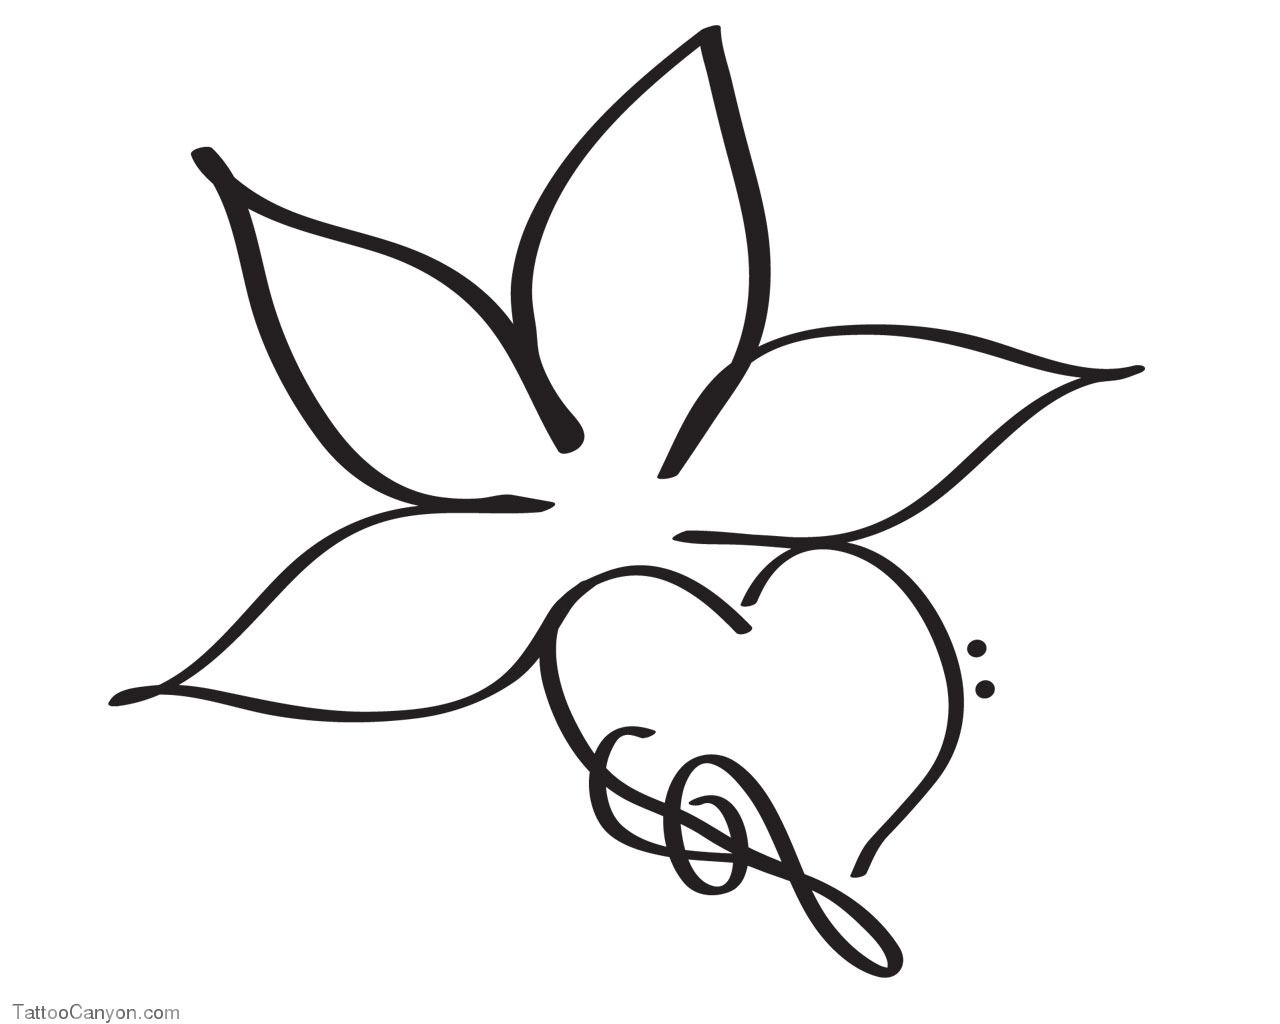 Free designs simple flower tattoo design wallpaper picture 14115 free designs simple flower tattoo design wallpaper picture 14115 izmirmasajfo